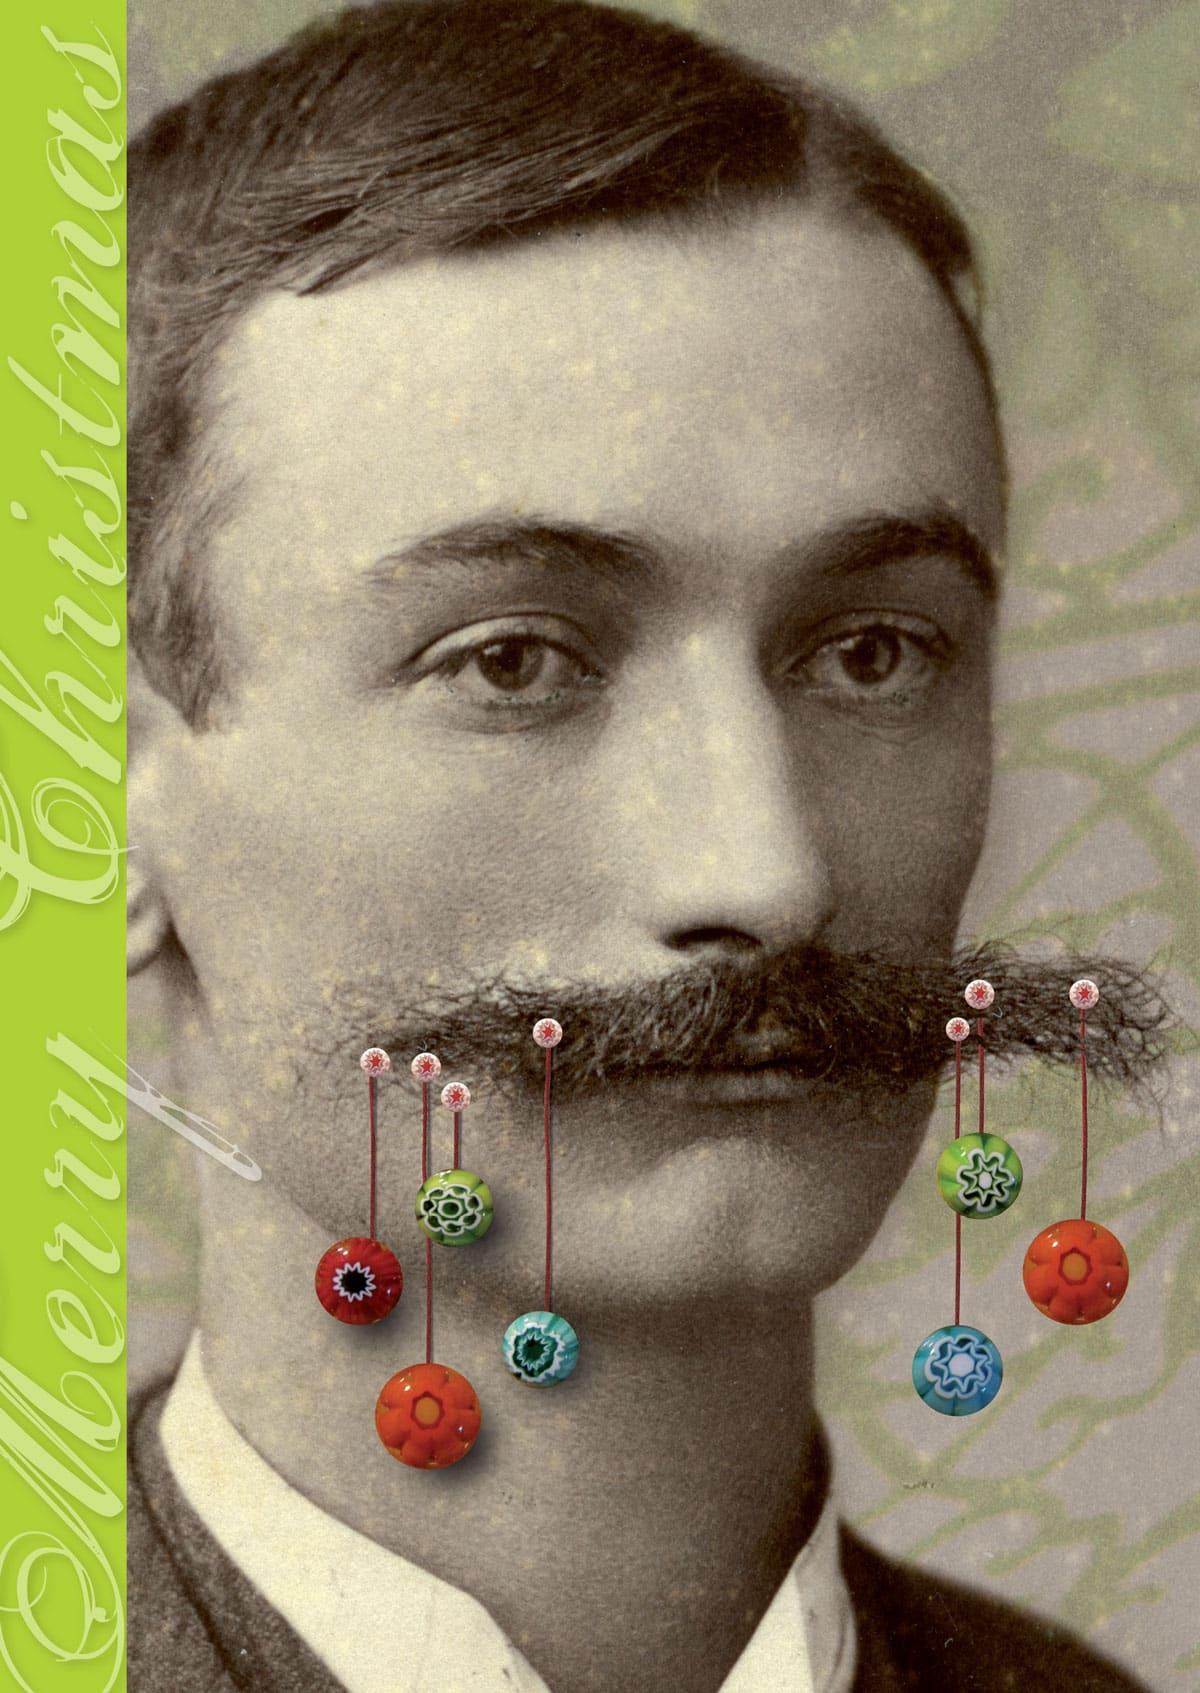 greeting-card-merry-christmas-mo-by-look-mama-101818-lookmama